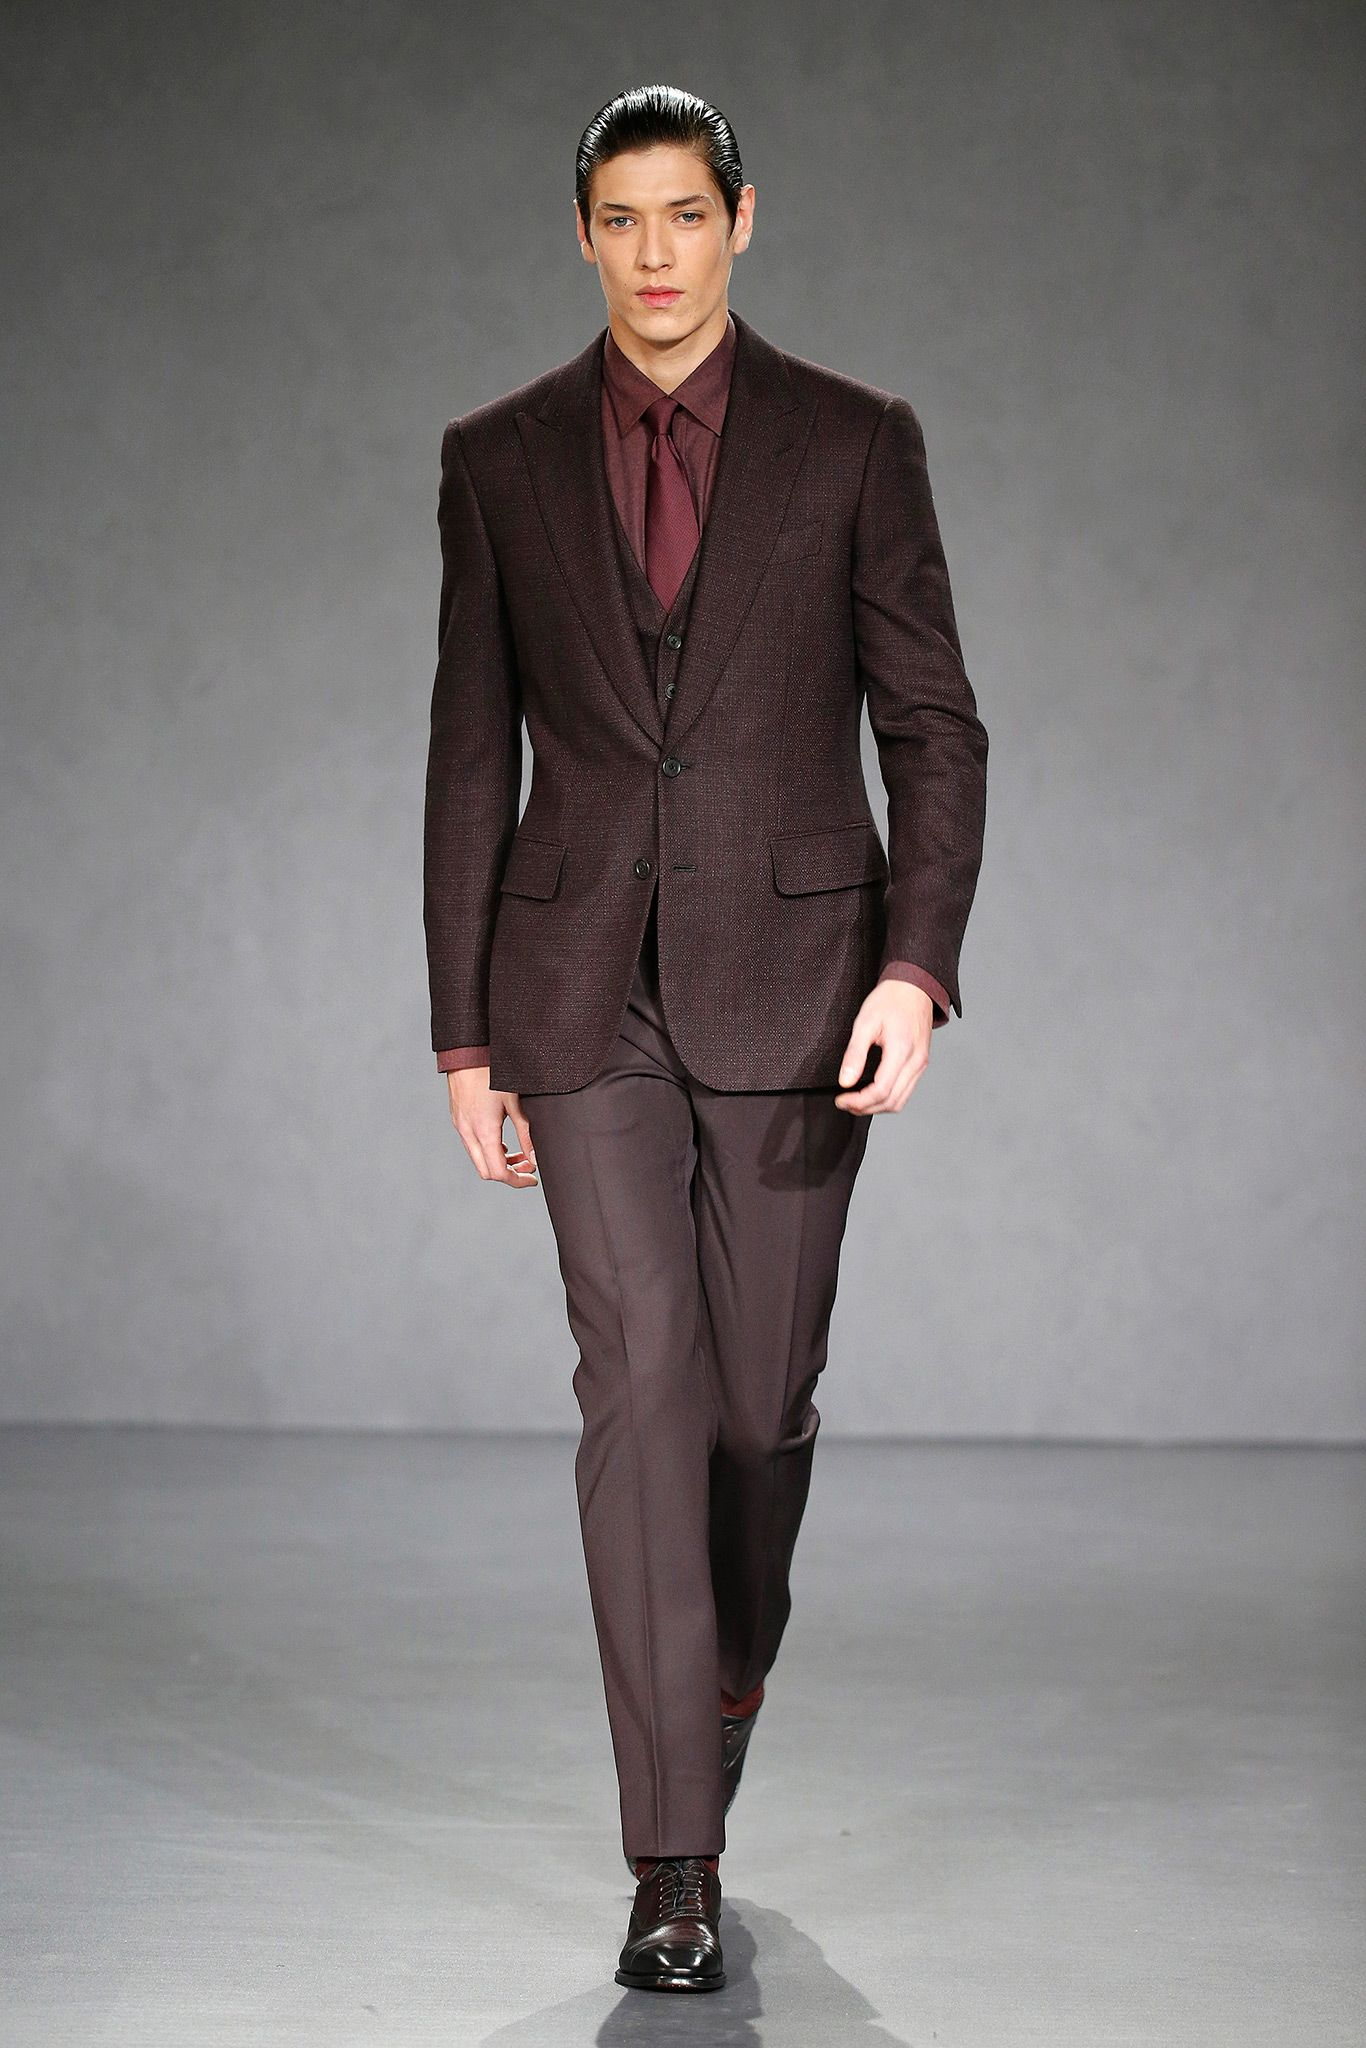 #Fashion #Menswear #Gieves&Hawkes